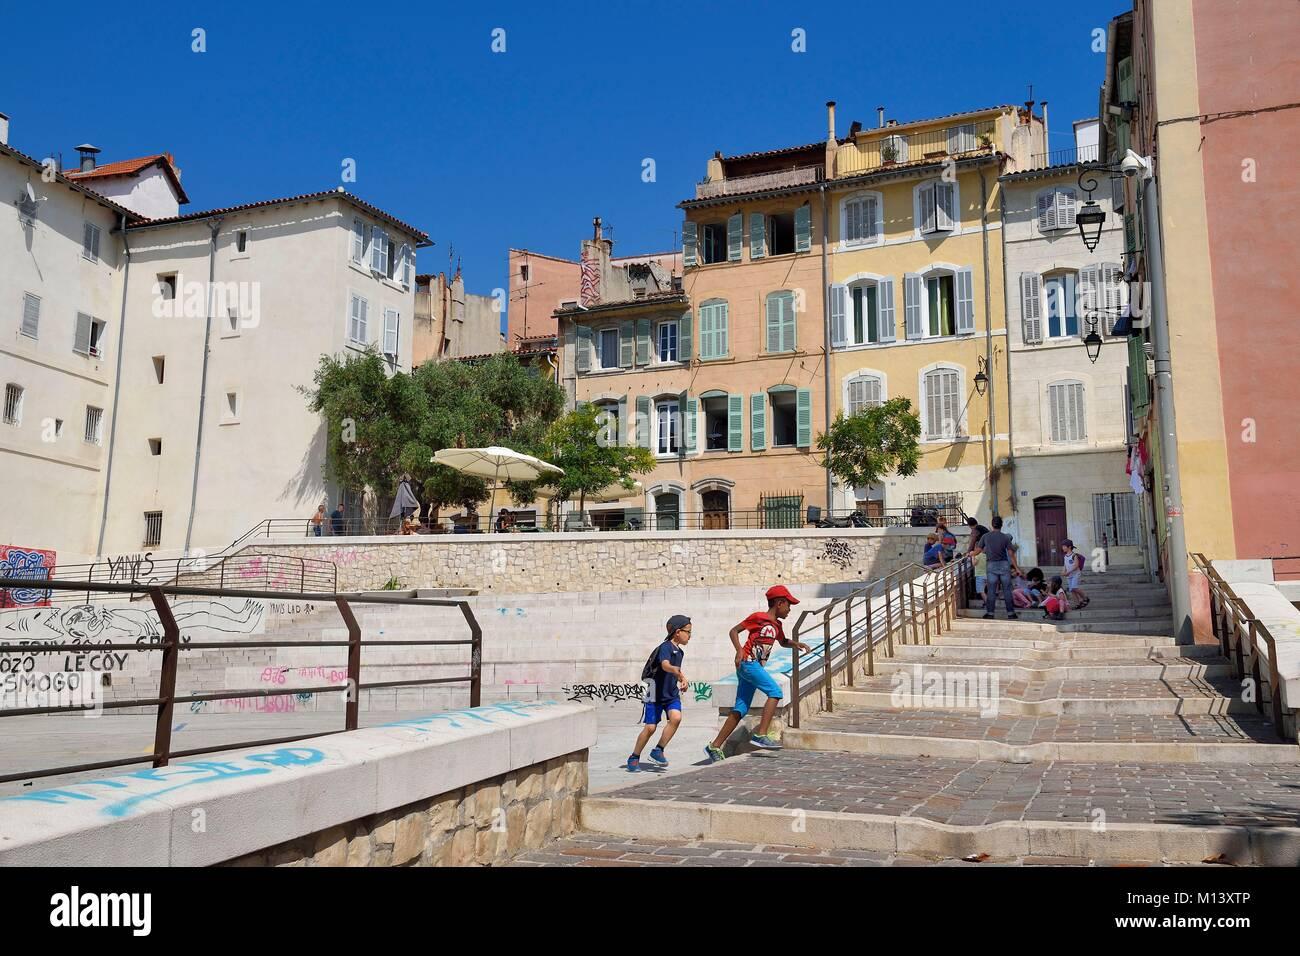 France, Bouches du Rhone, Marseille, Panier district, rue des repenties stairs along the place du refuge - Stock Image